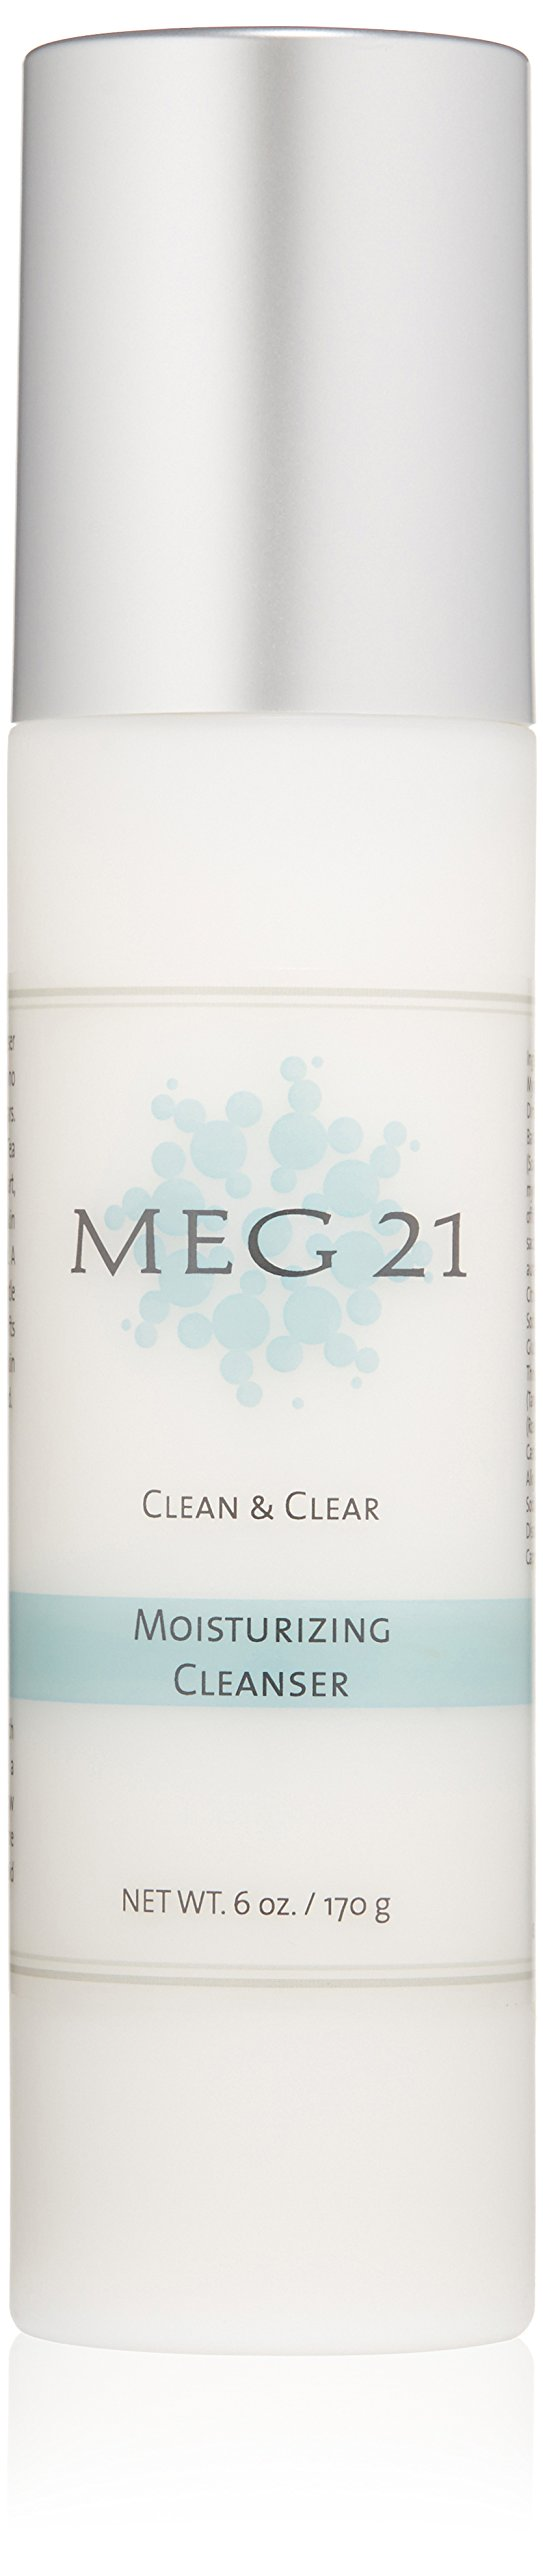 MEG 21 Clean and Clear Moisturizing Cleanser Cream, 6 Oz